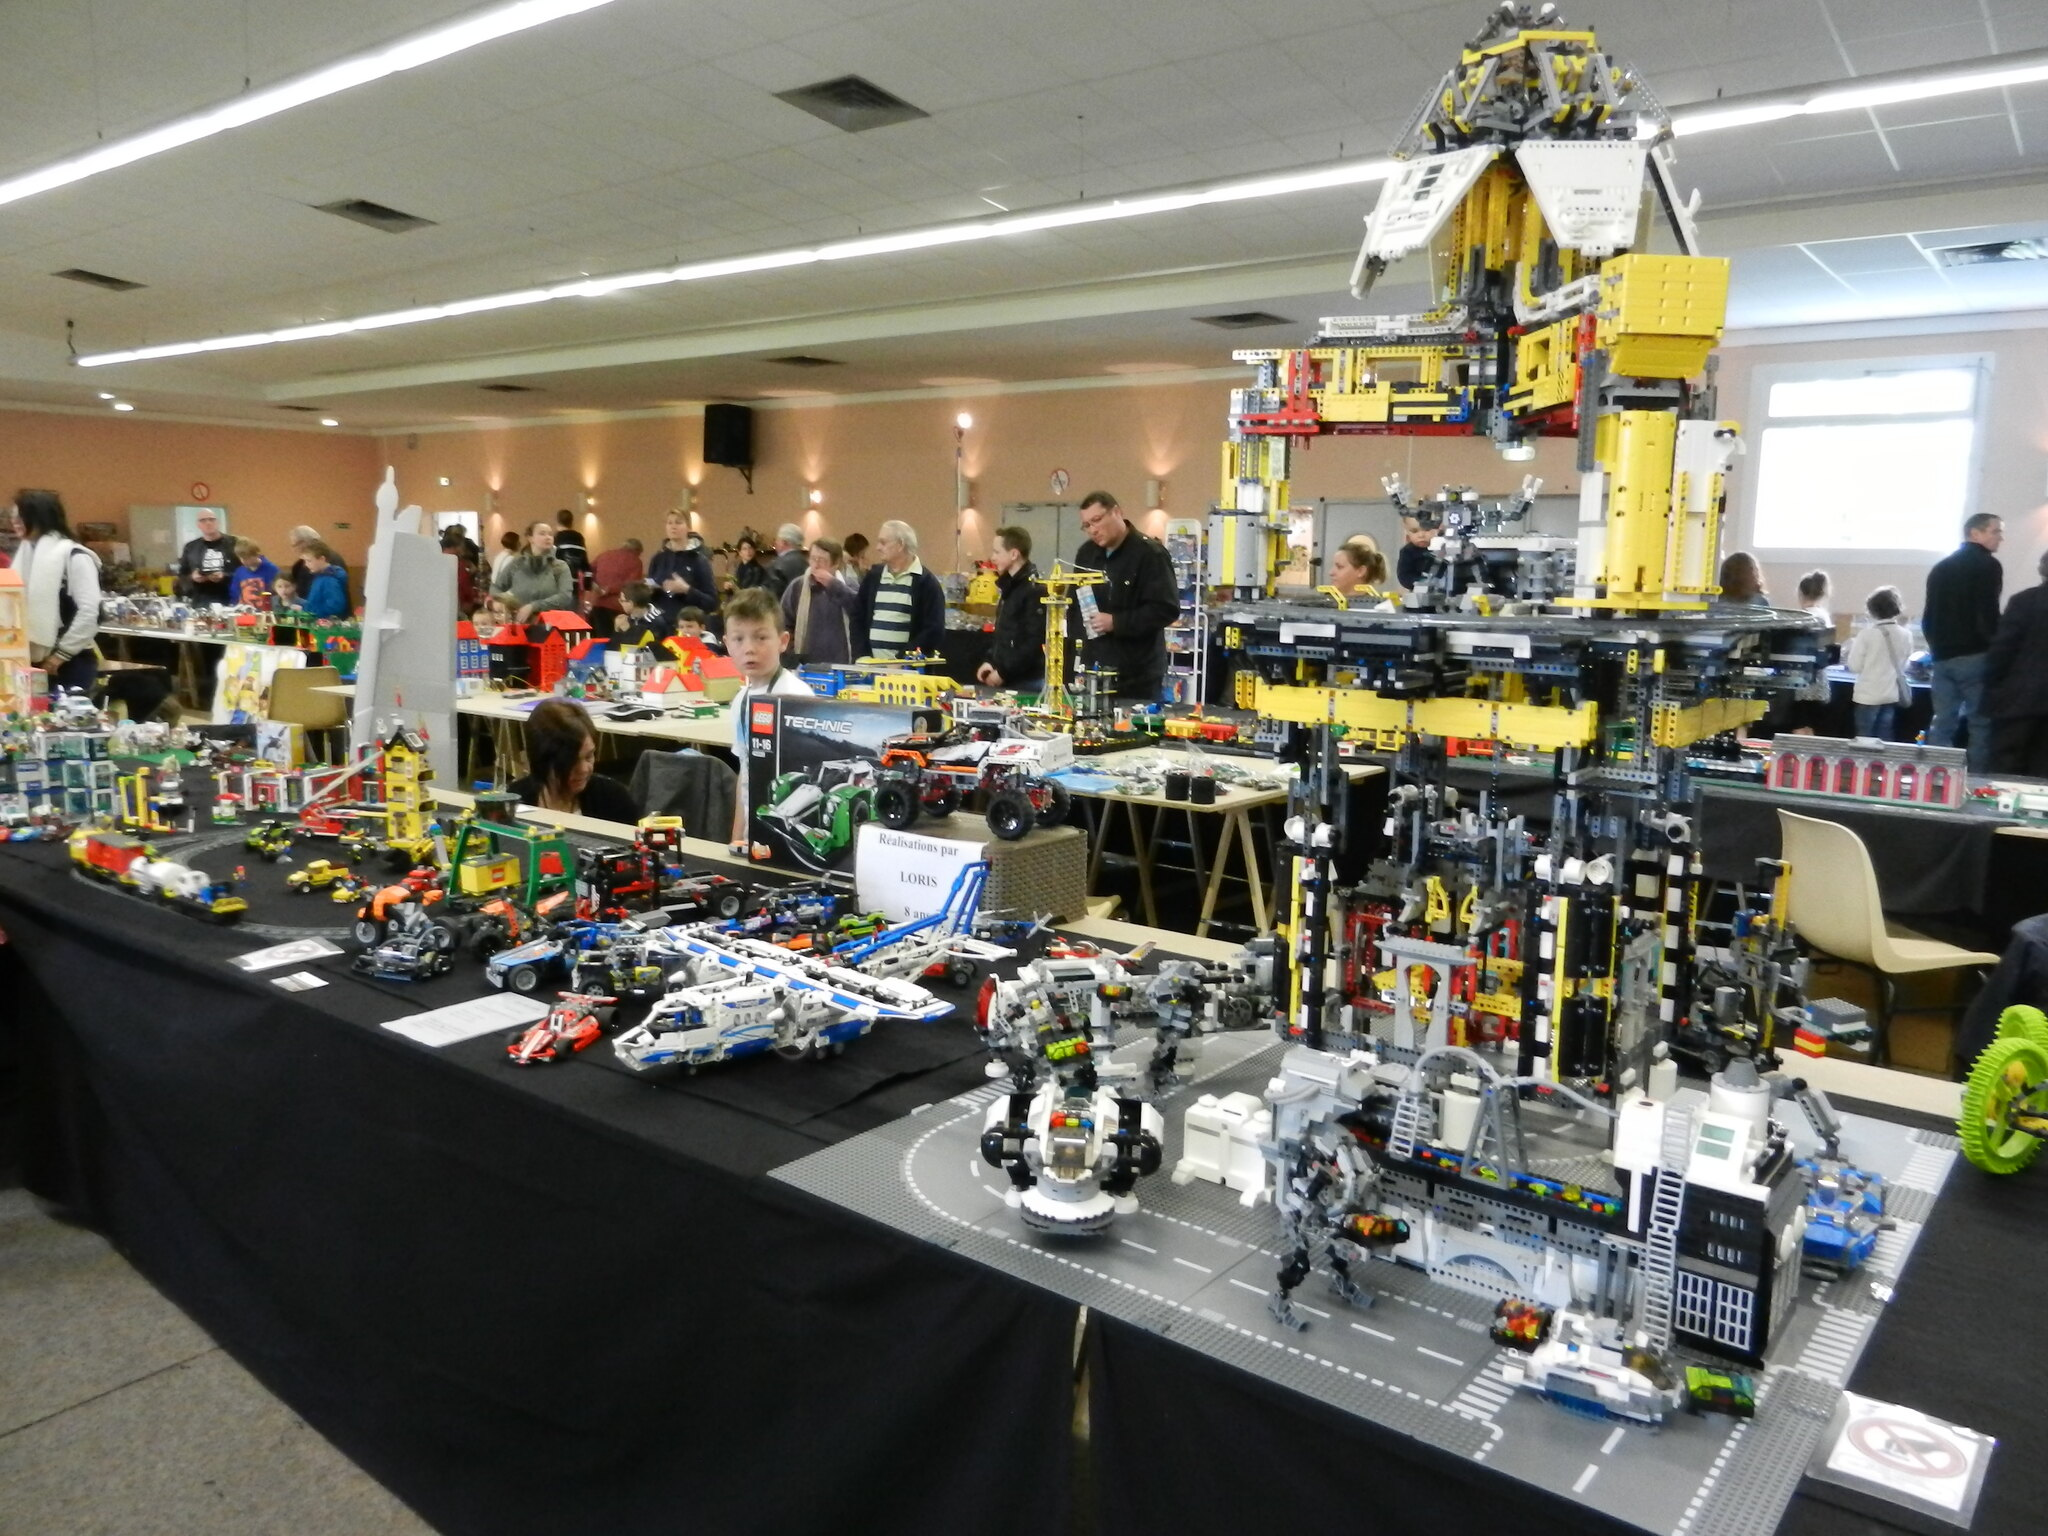 [Expo] Compte-rendu de la Briqu'Expo de Mulsanne 18790097832_1a79508781_k